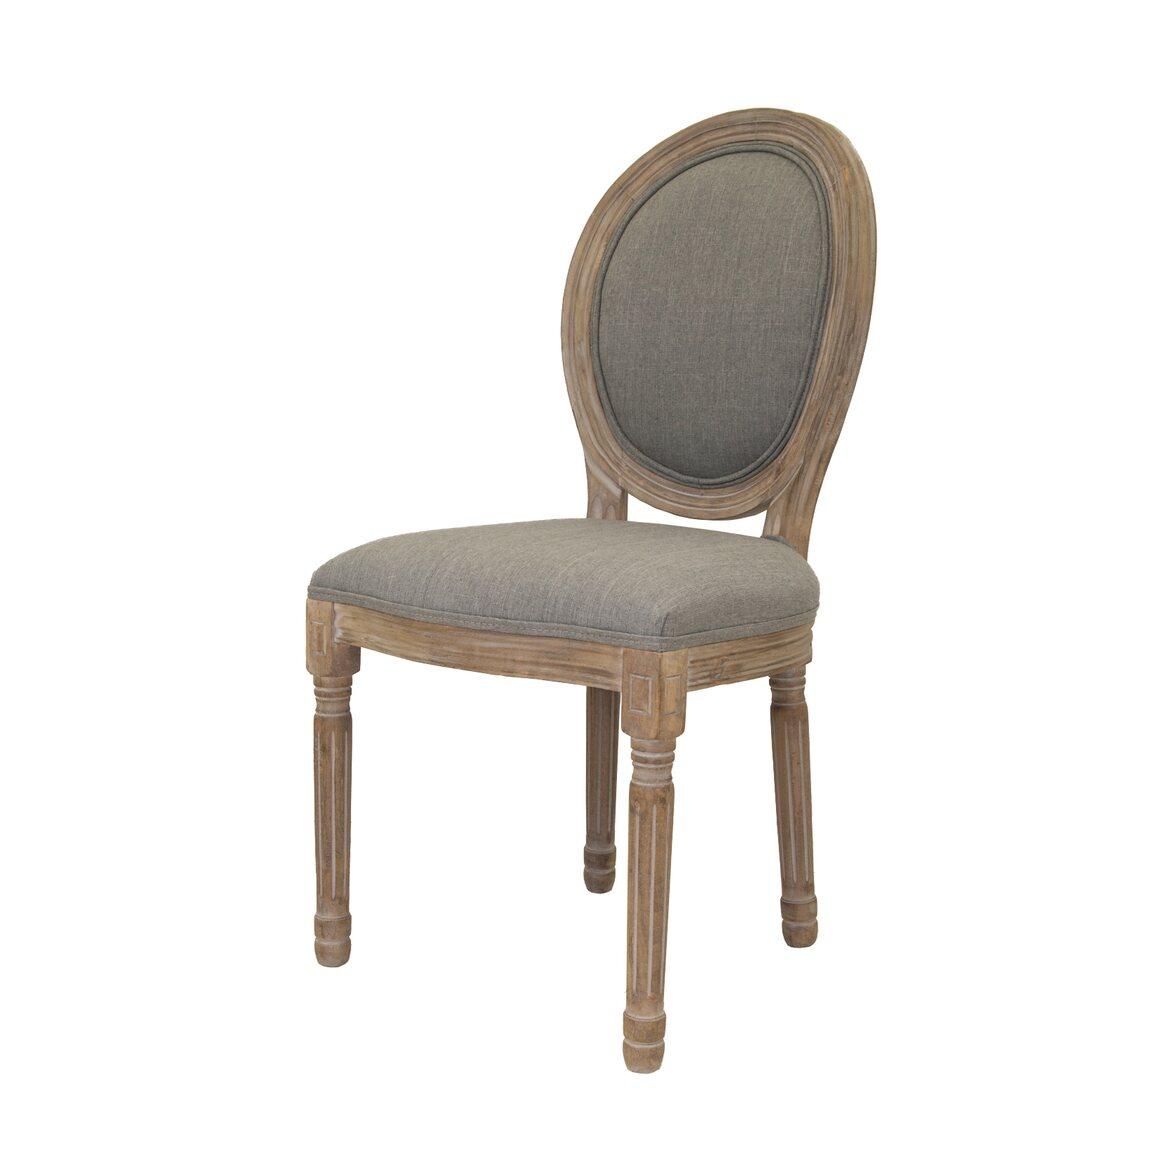 Стул Volker grey 3 | Обеденные стулья Kingsby